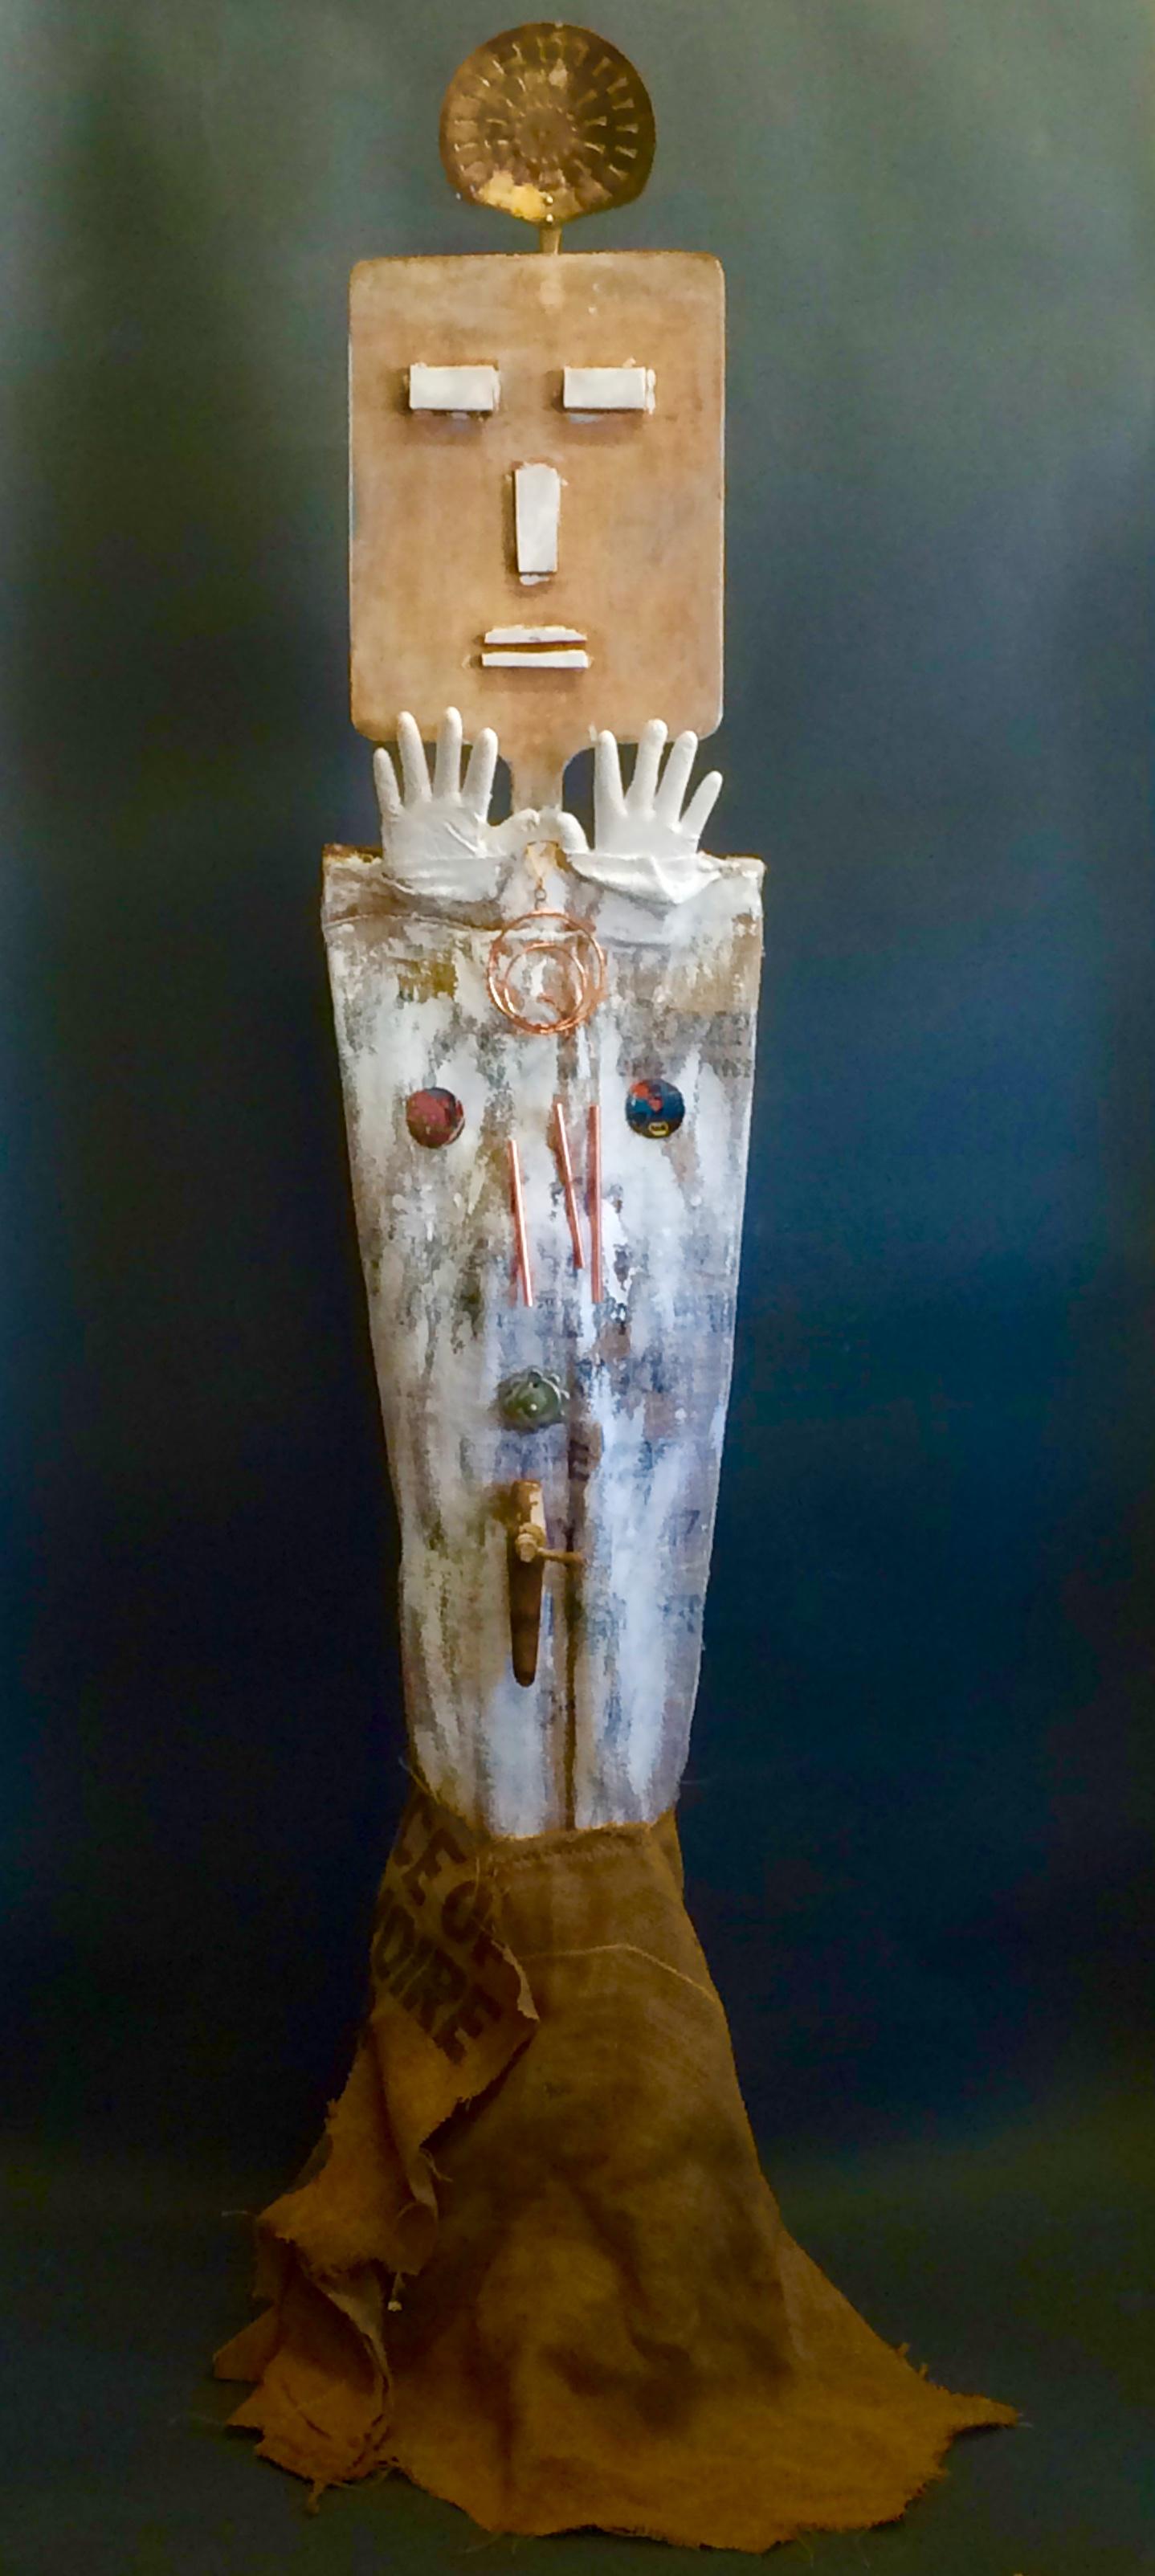 Sun God  Found objects, burlap, nails, gesso, vinyl glove and glue 97 x 27 x 27 in/ 246.3 x 68.5 x 68.5 cm